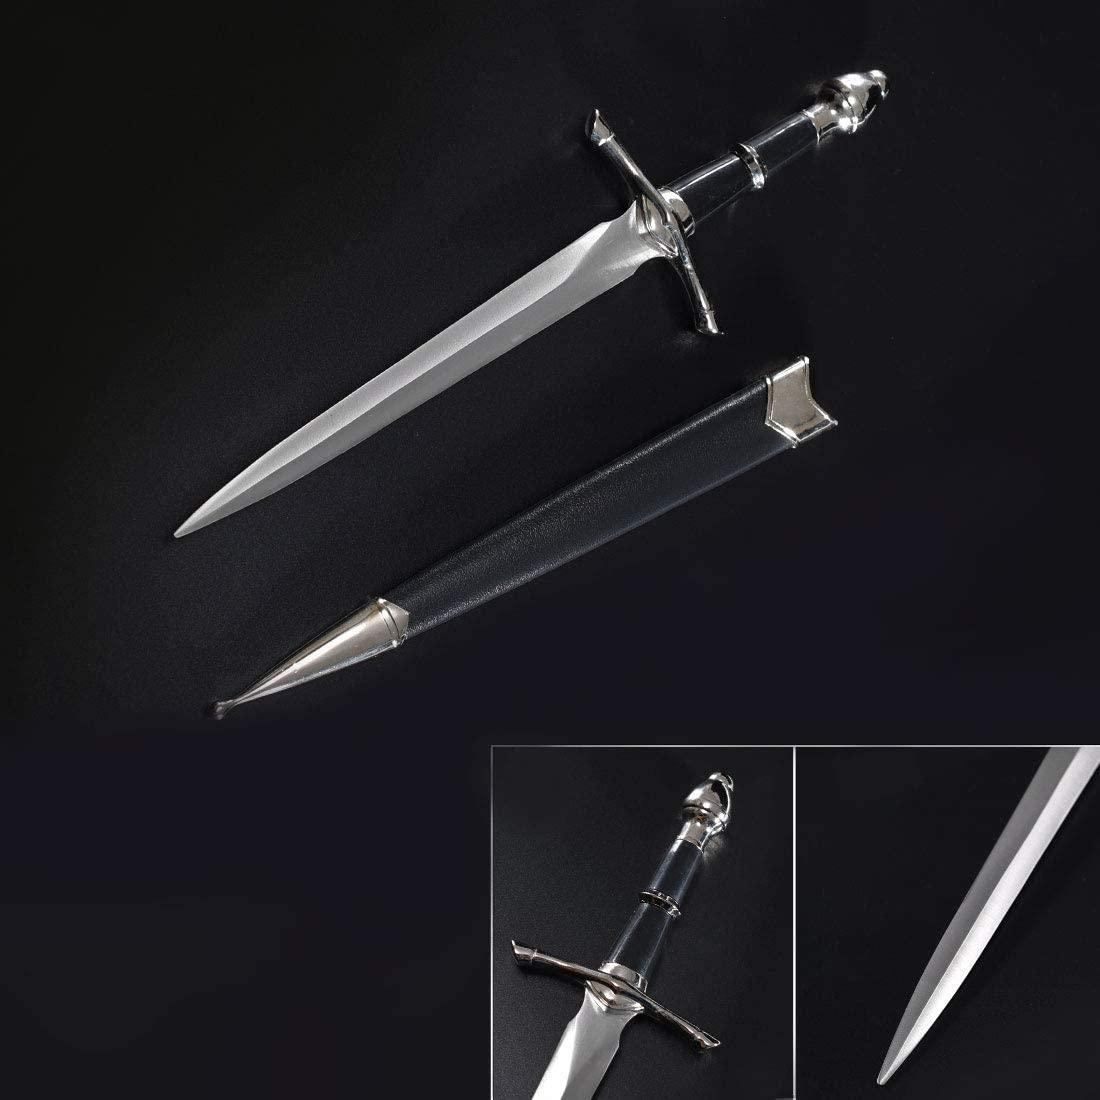 RUYI Sword-Medieval Sword,Battle Ready,Full Tang, Sharp,Knife,Scabbard